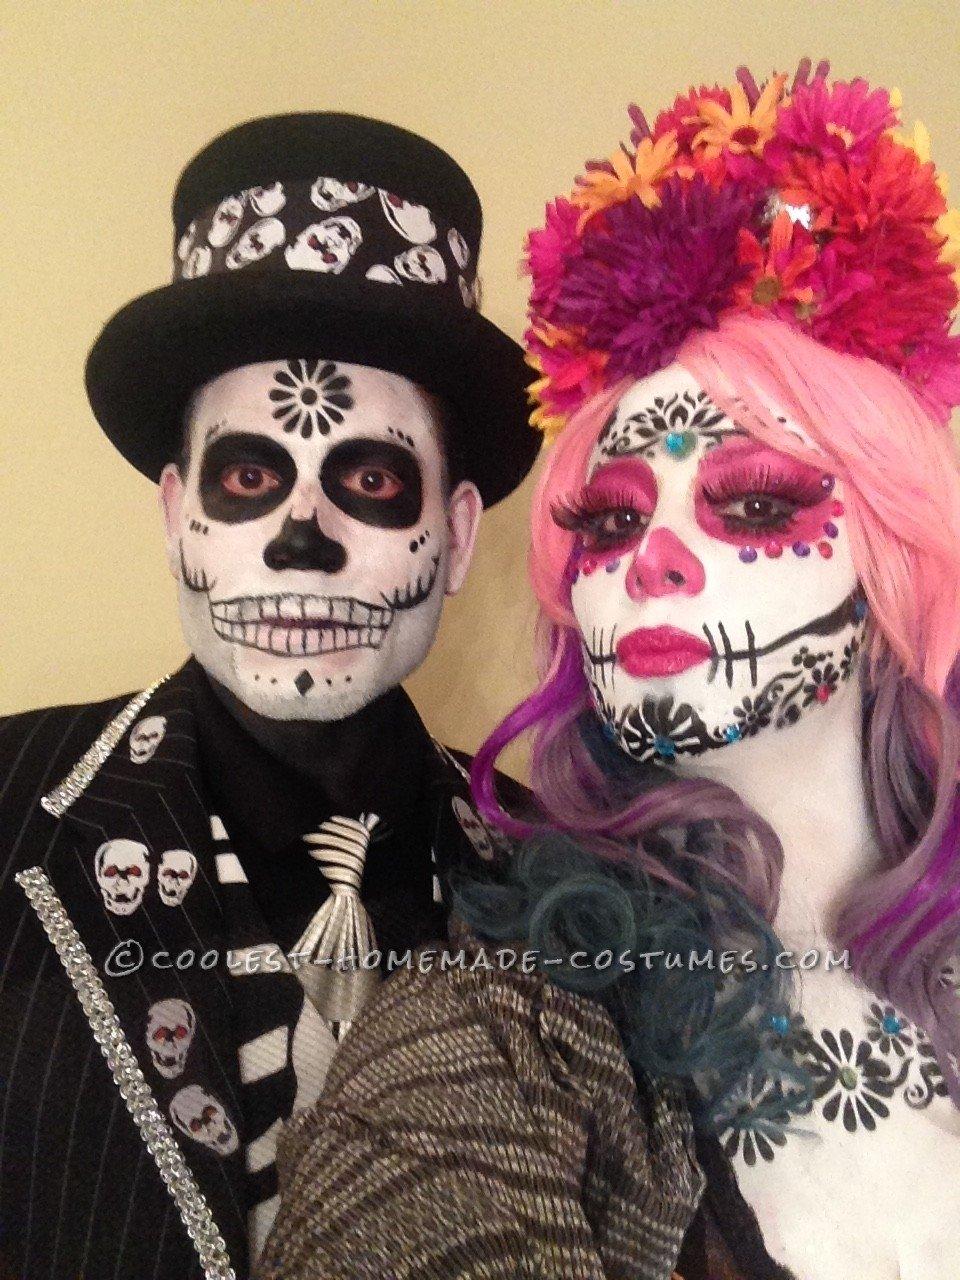 10 Best Dia De Los Muertos Costume Ideas 50 coolest homemade dia de los muertos costumes 3 2020